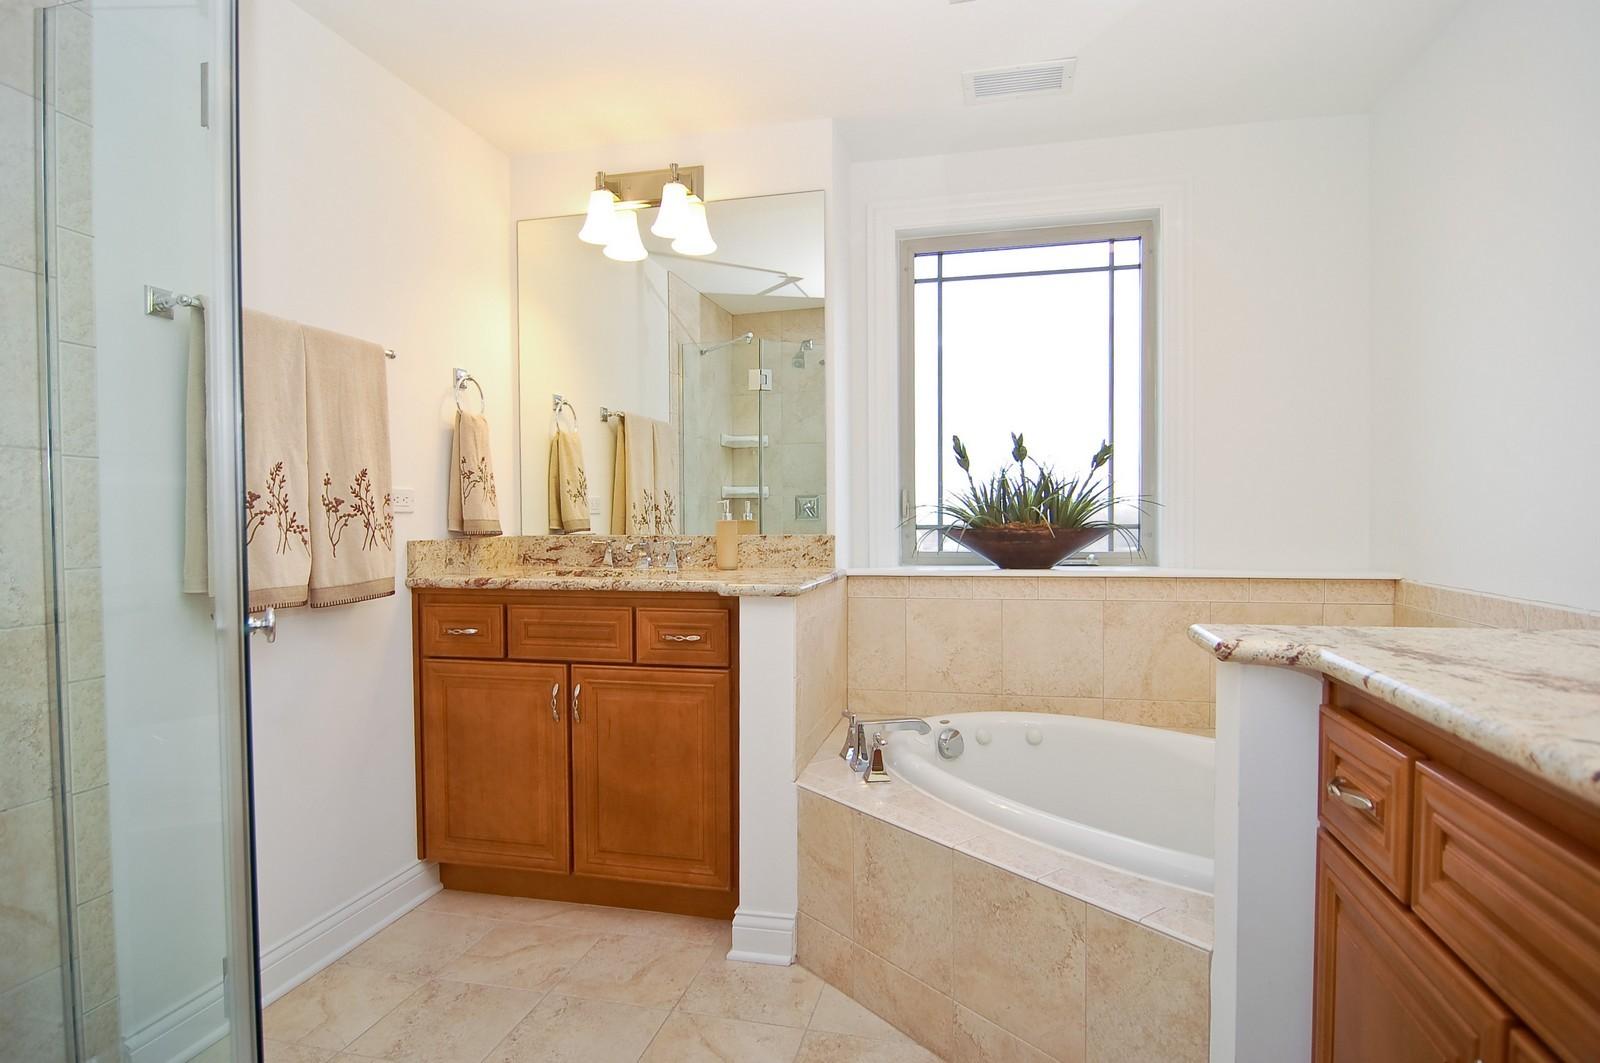 Real Estate Photography - 200- 7B Lake Street, St Joseph, MI, 49085 - Master Bathroom